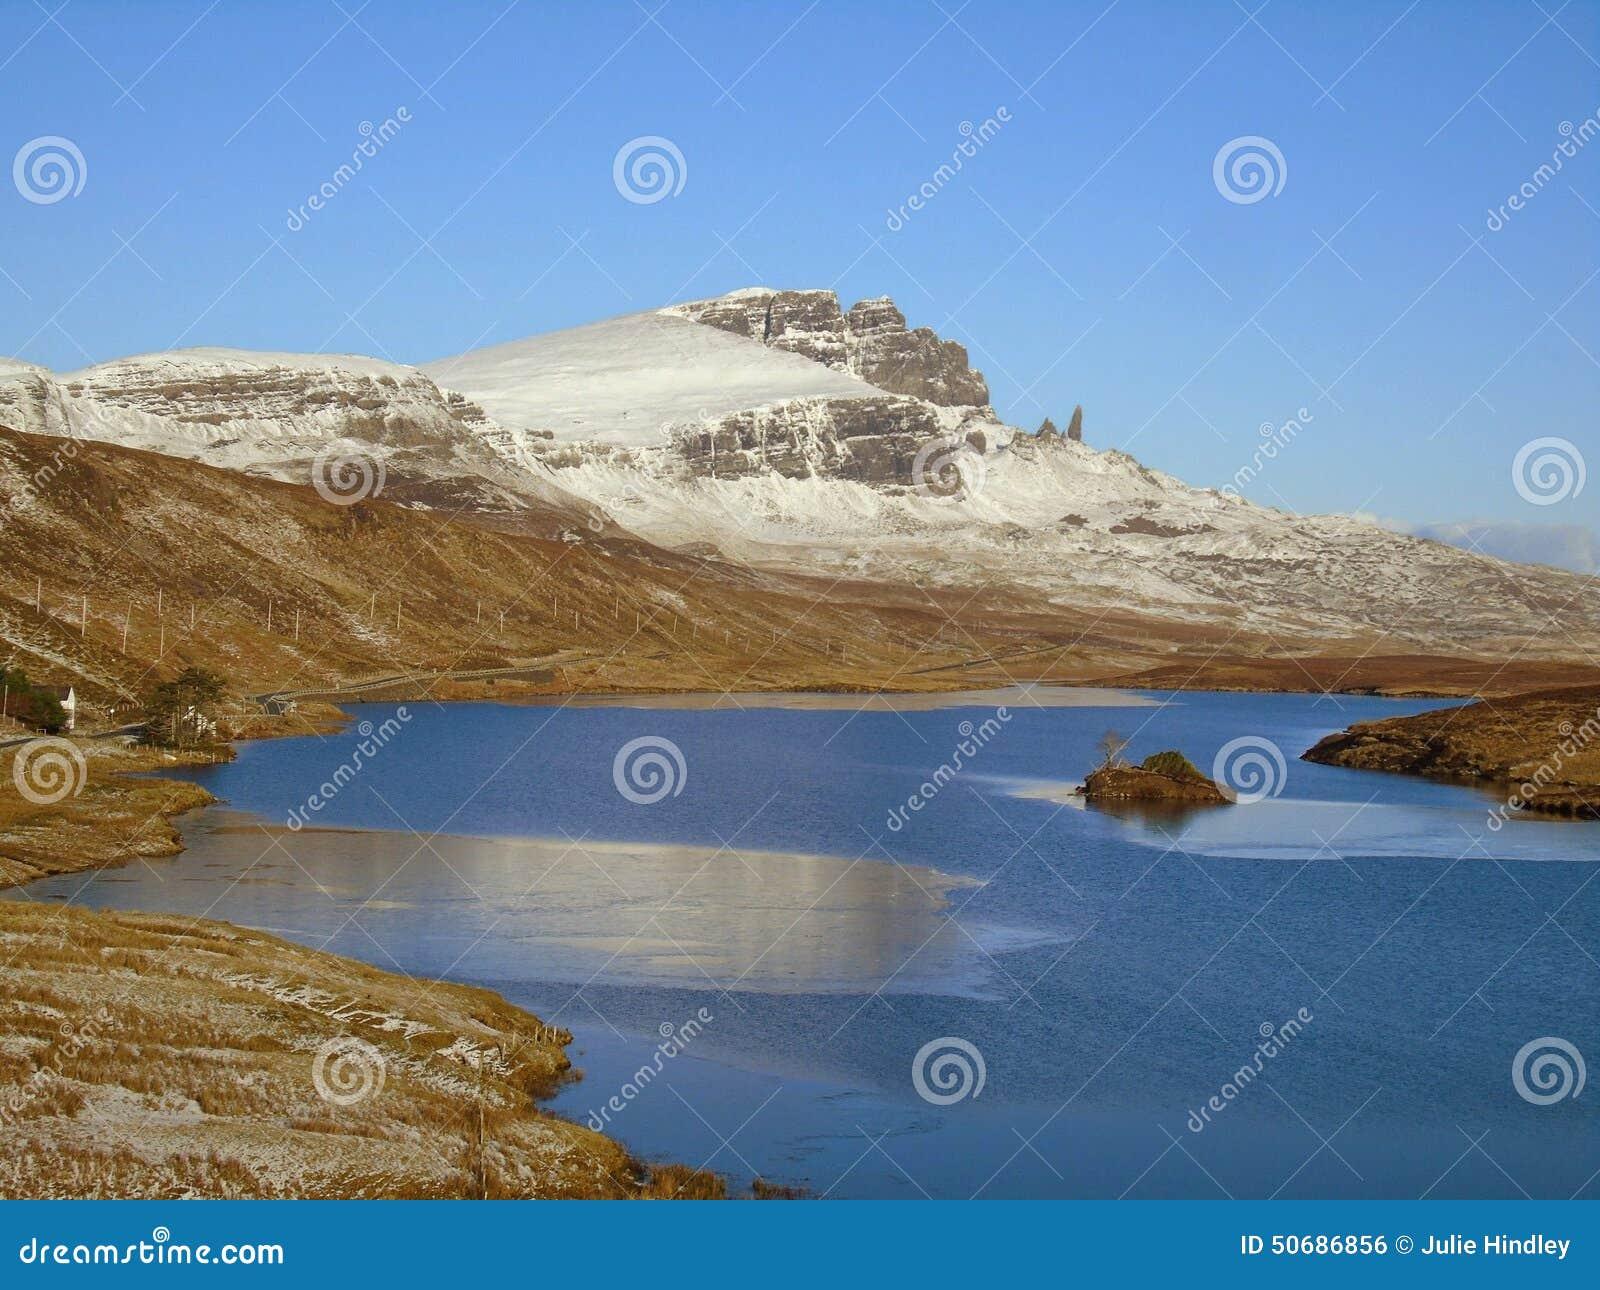 Download 人老storr 库存照片. 图片 包括有 操作的, 北部, 灯塔, 苏格兰, 早晨, 高地, 在附近, 运行 - 50686856